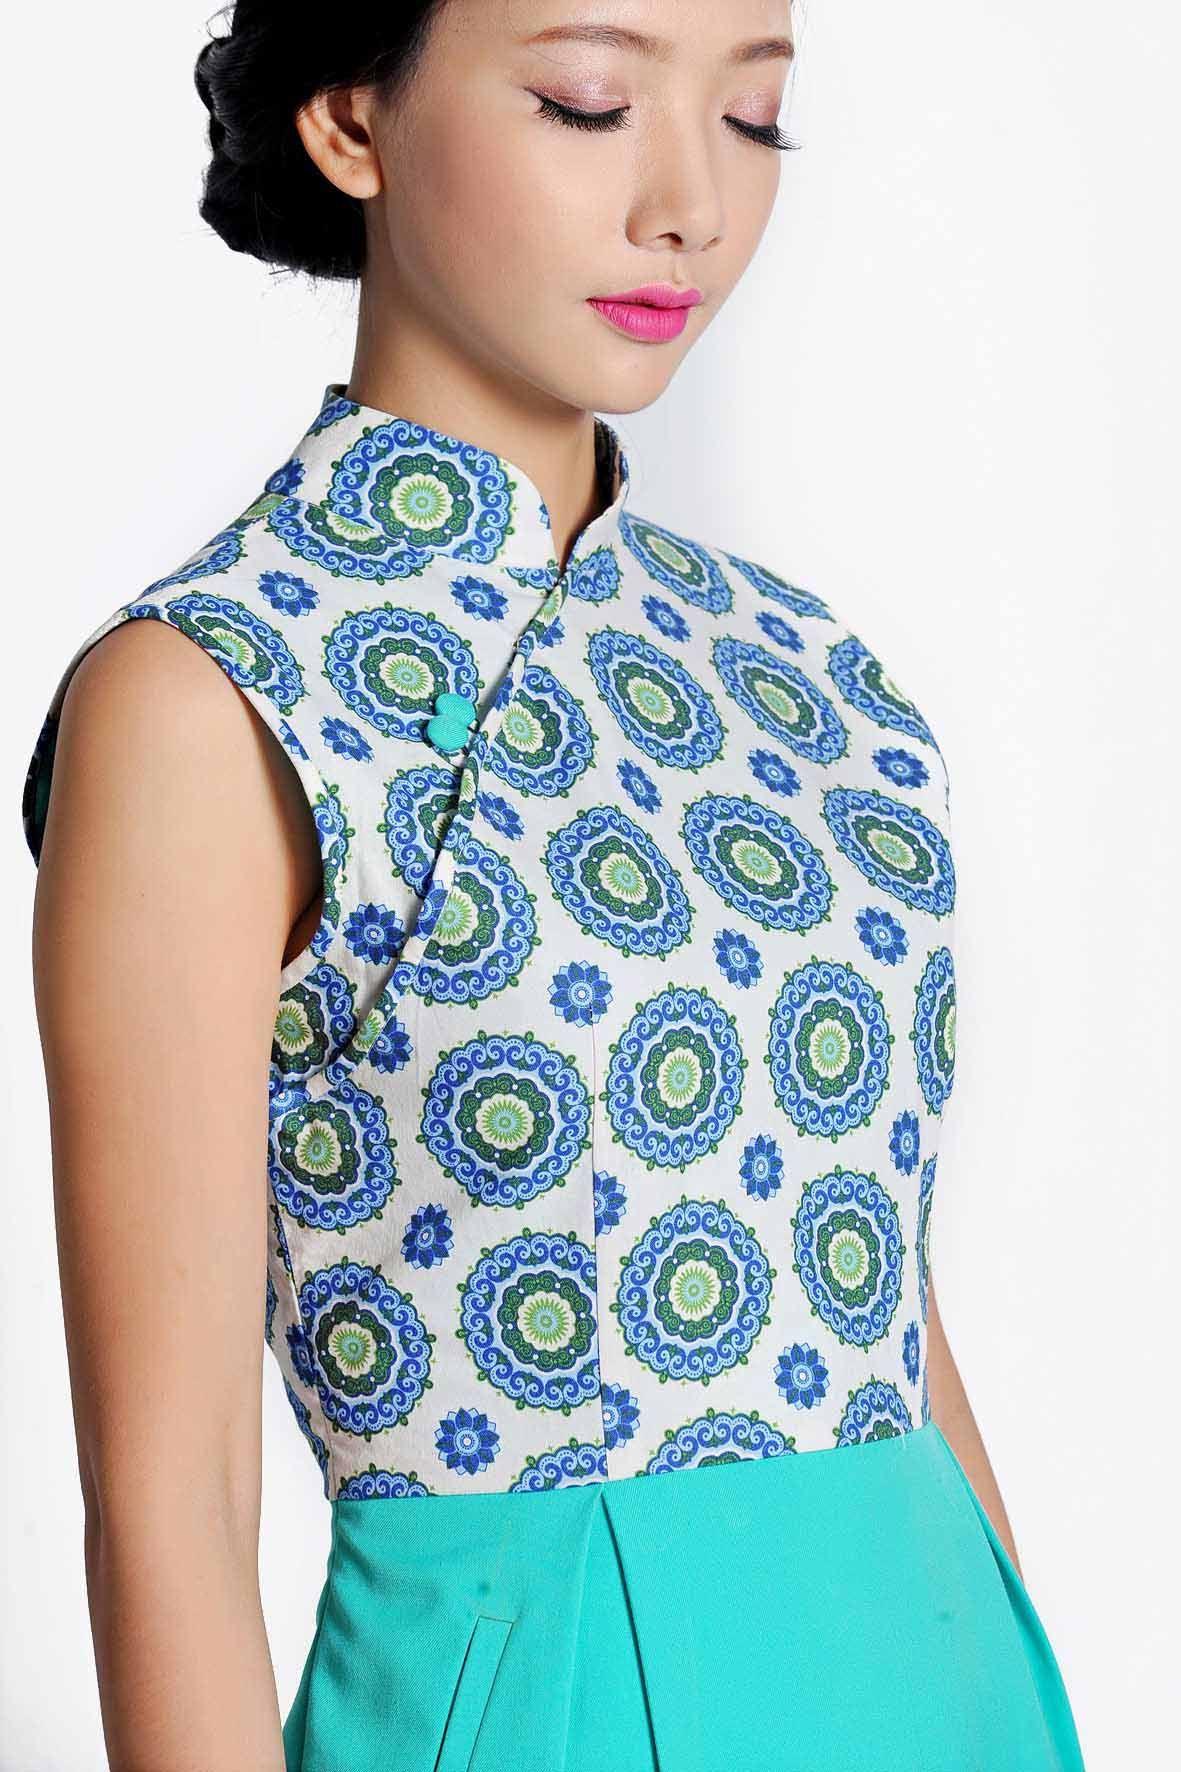 Modern cheongsam online shop Singapore Vestidos